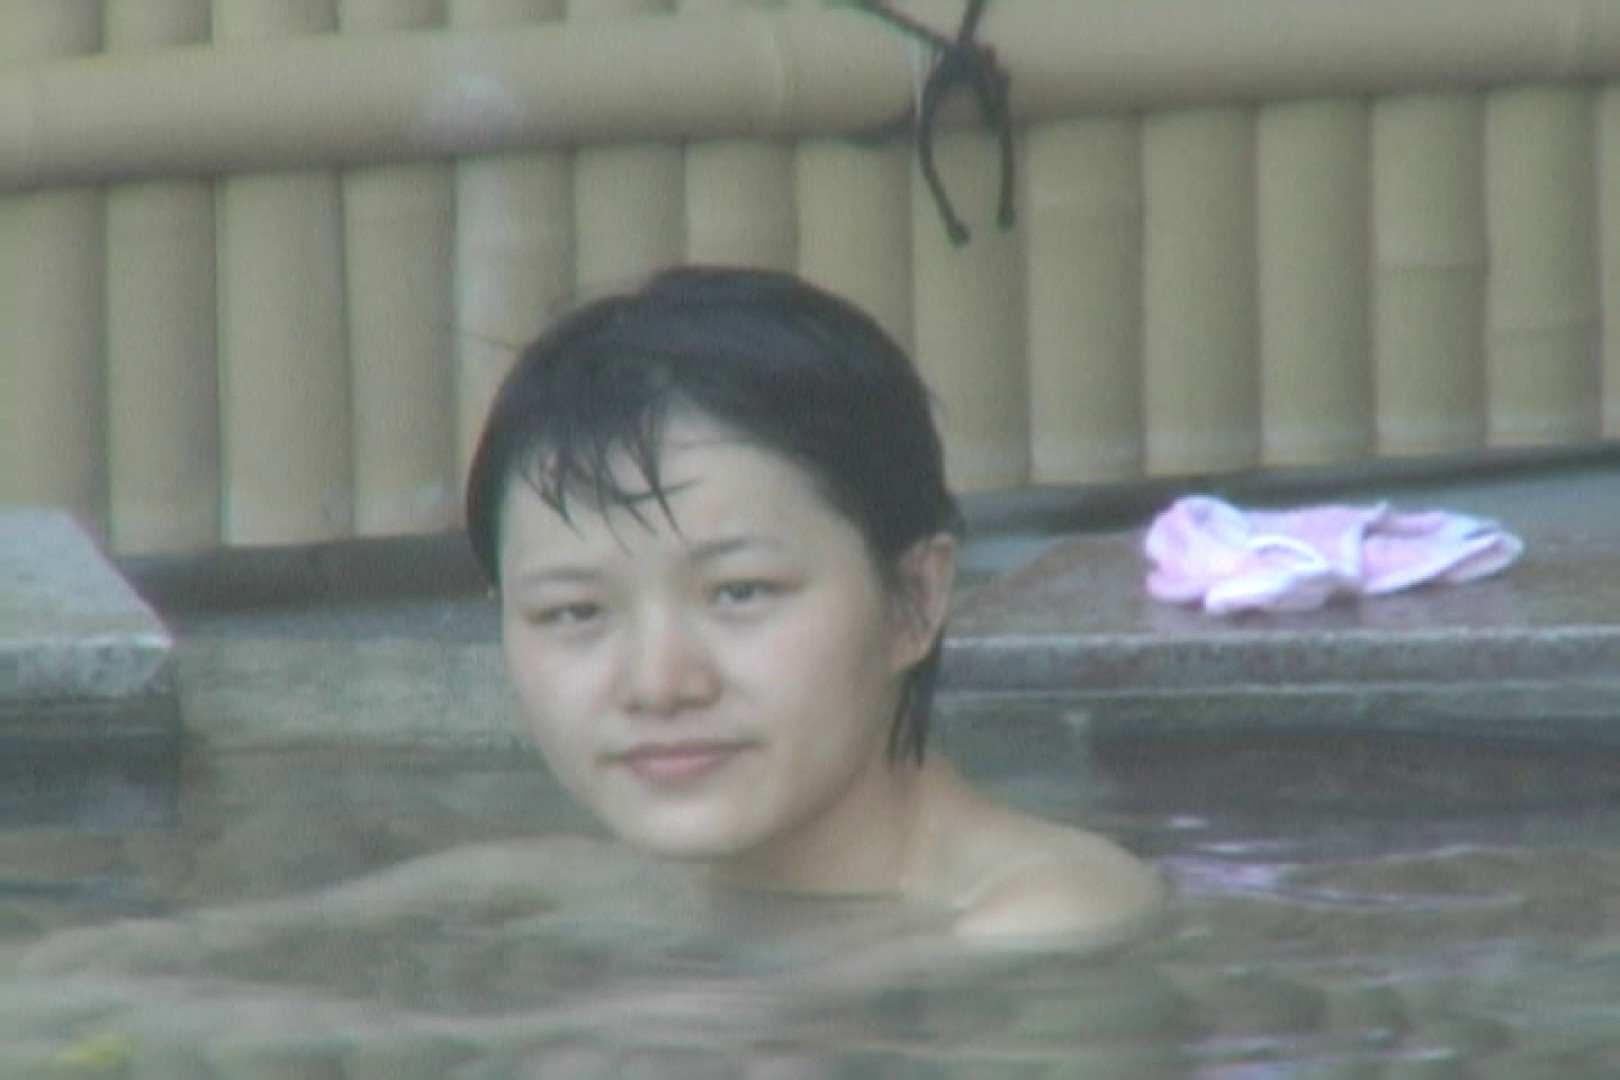 Aquaな露天風呂Vol.116 露天風呂編  107PIX 64